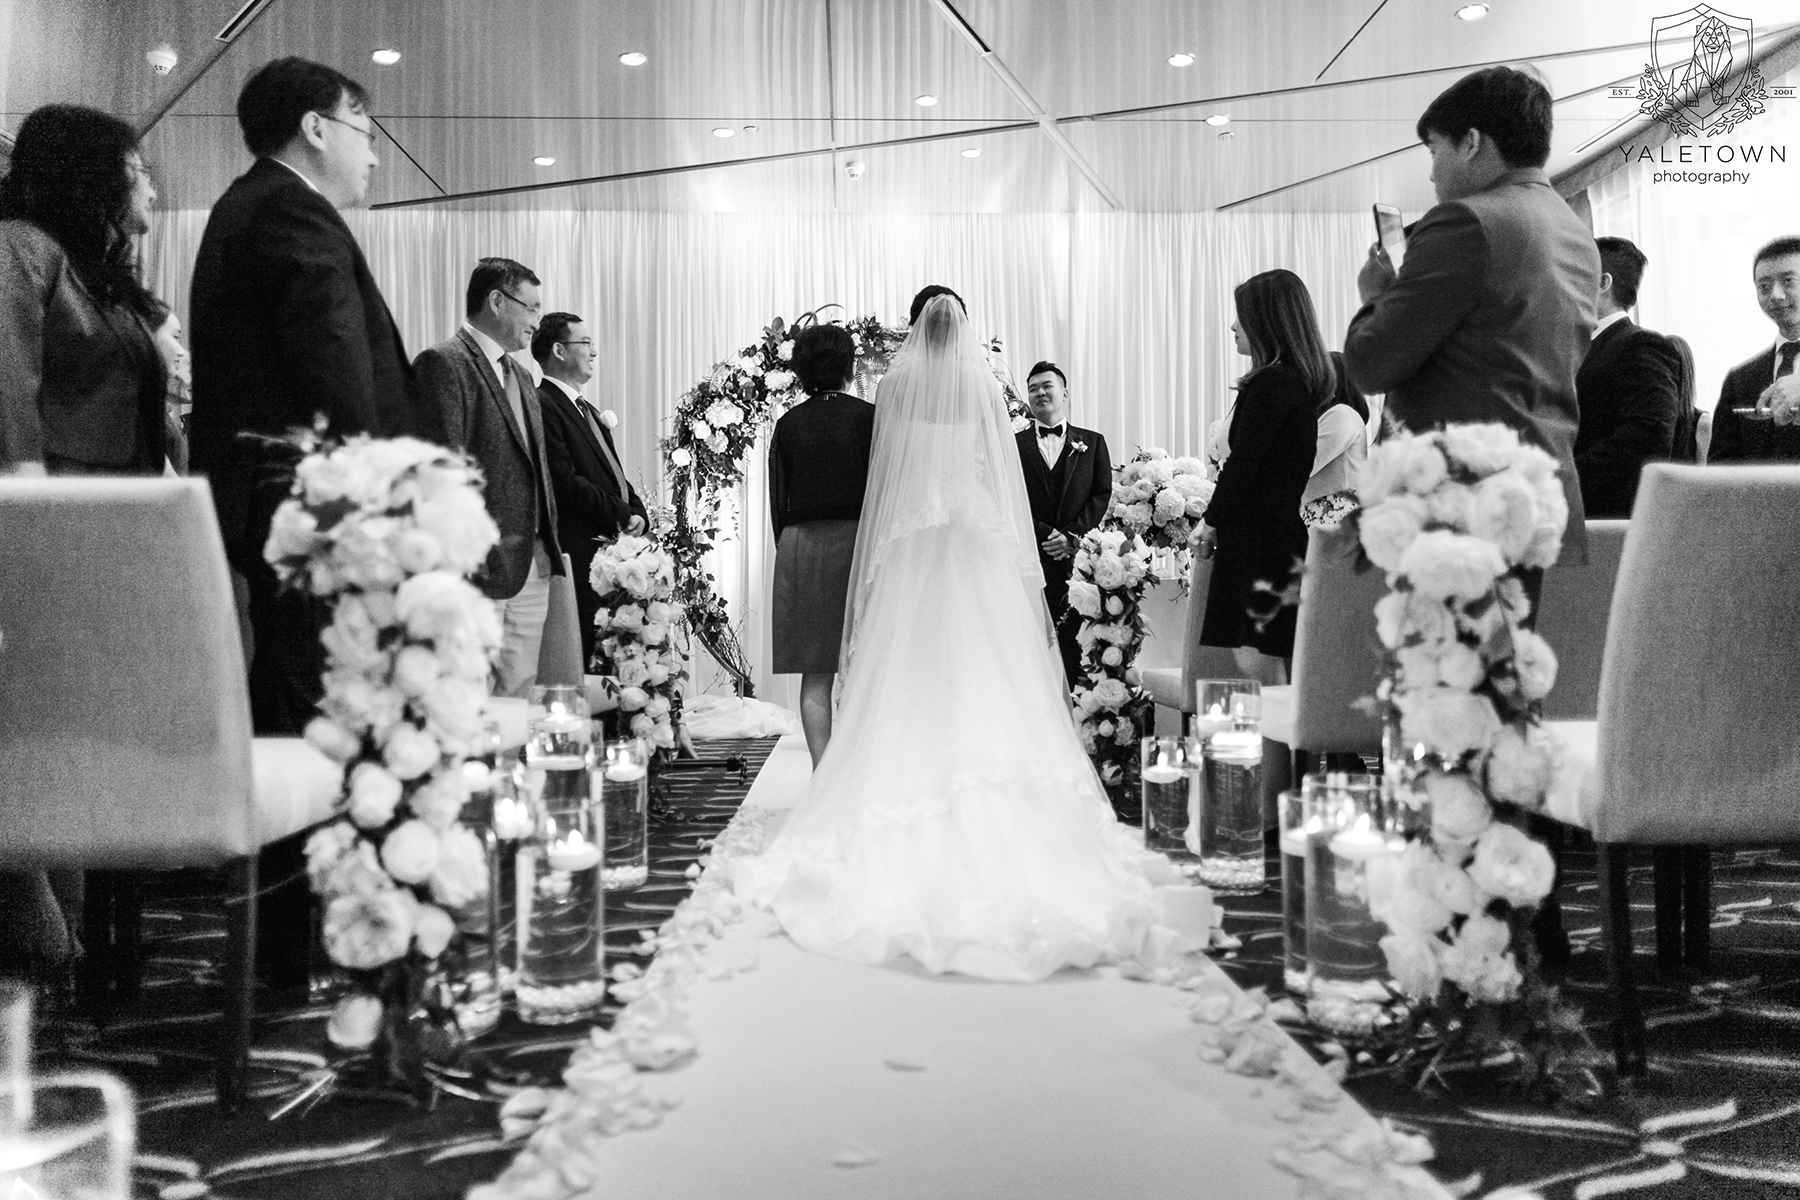 Wedding-Ceremony-Bride-Groom-Rosewood-Hotel-Georgia-Vancouver-Wedding-Yaletown-Photography-photo